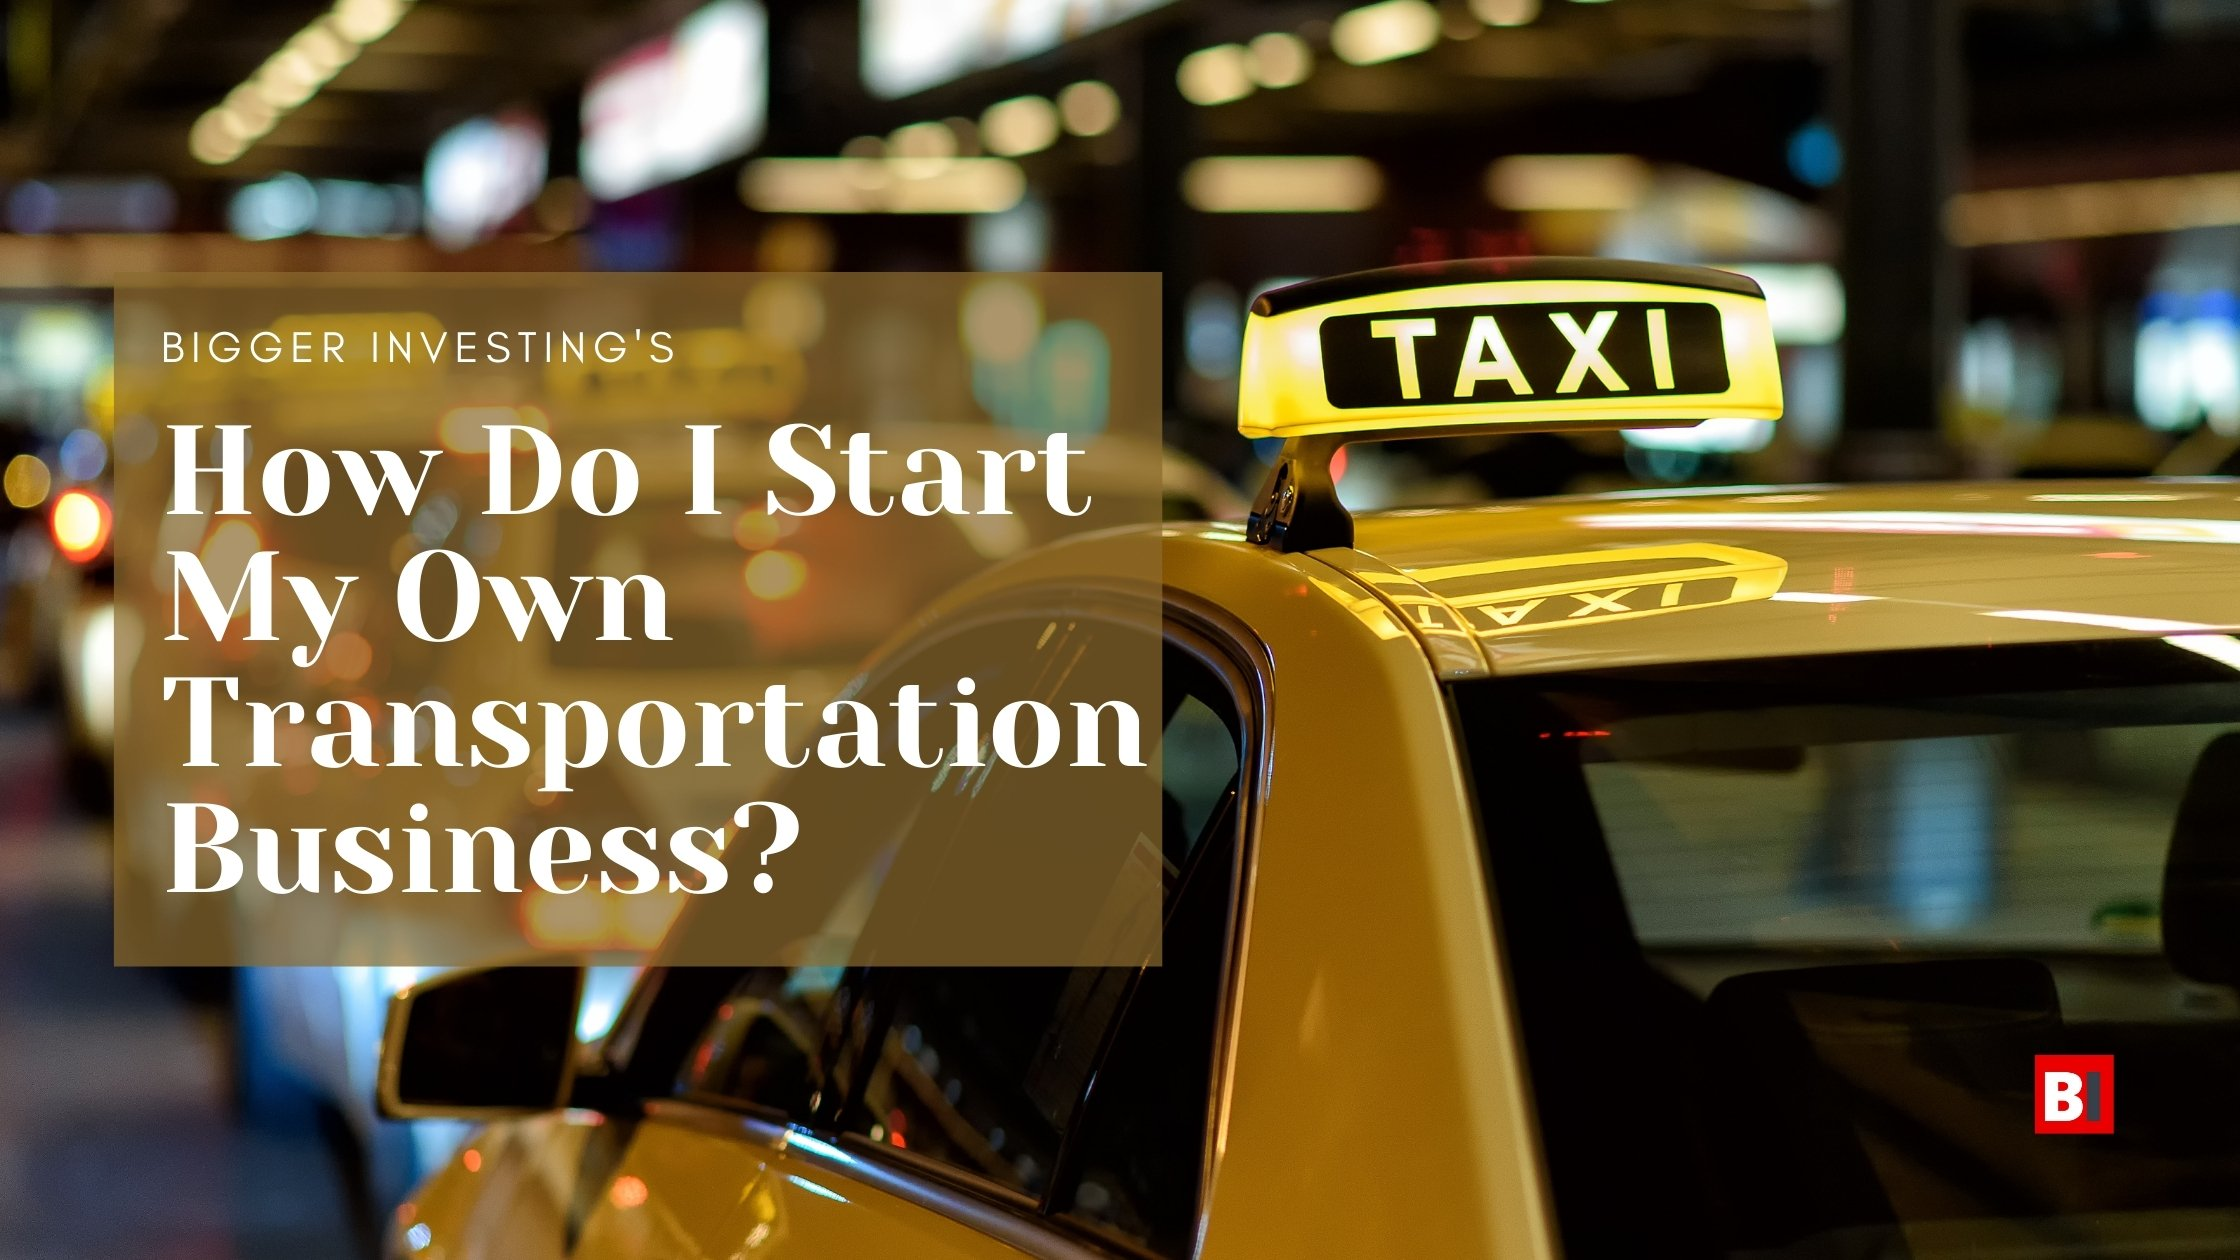 How Do I Start My Own Transportation Business?